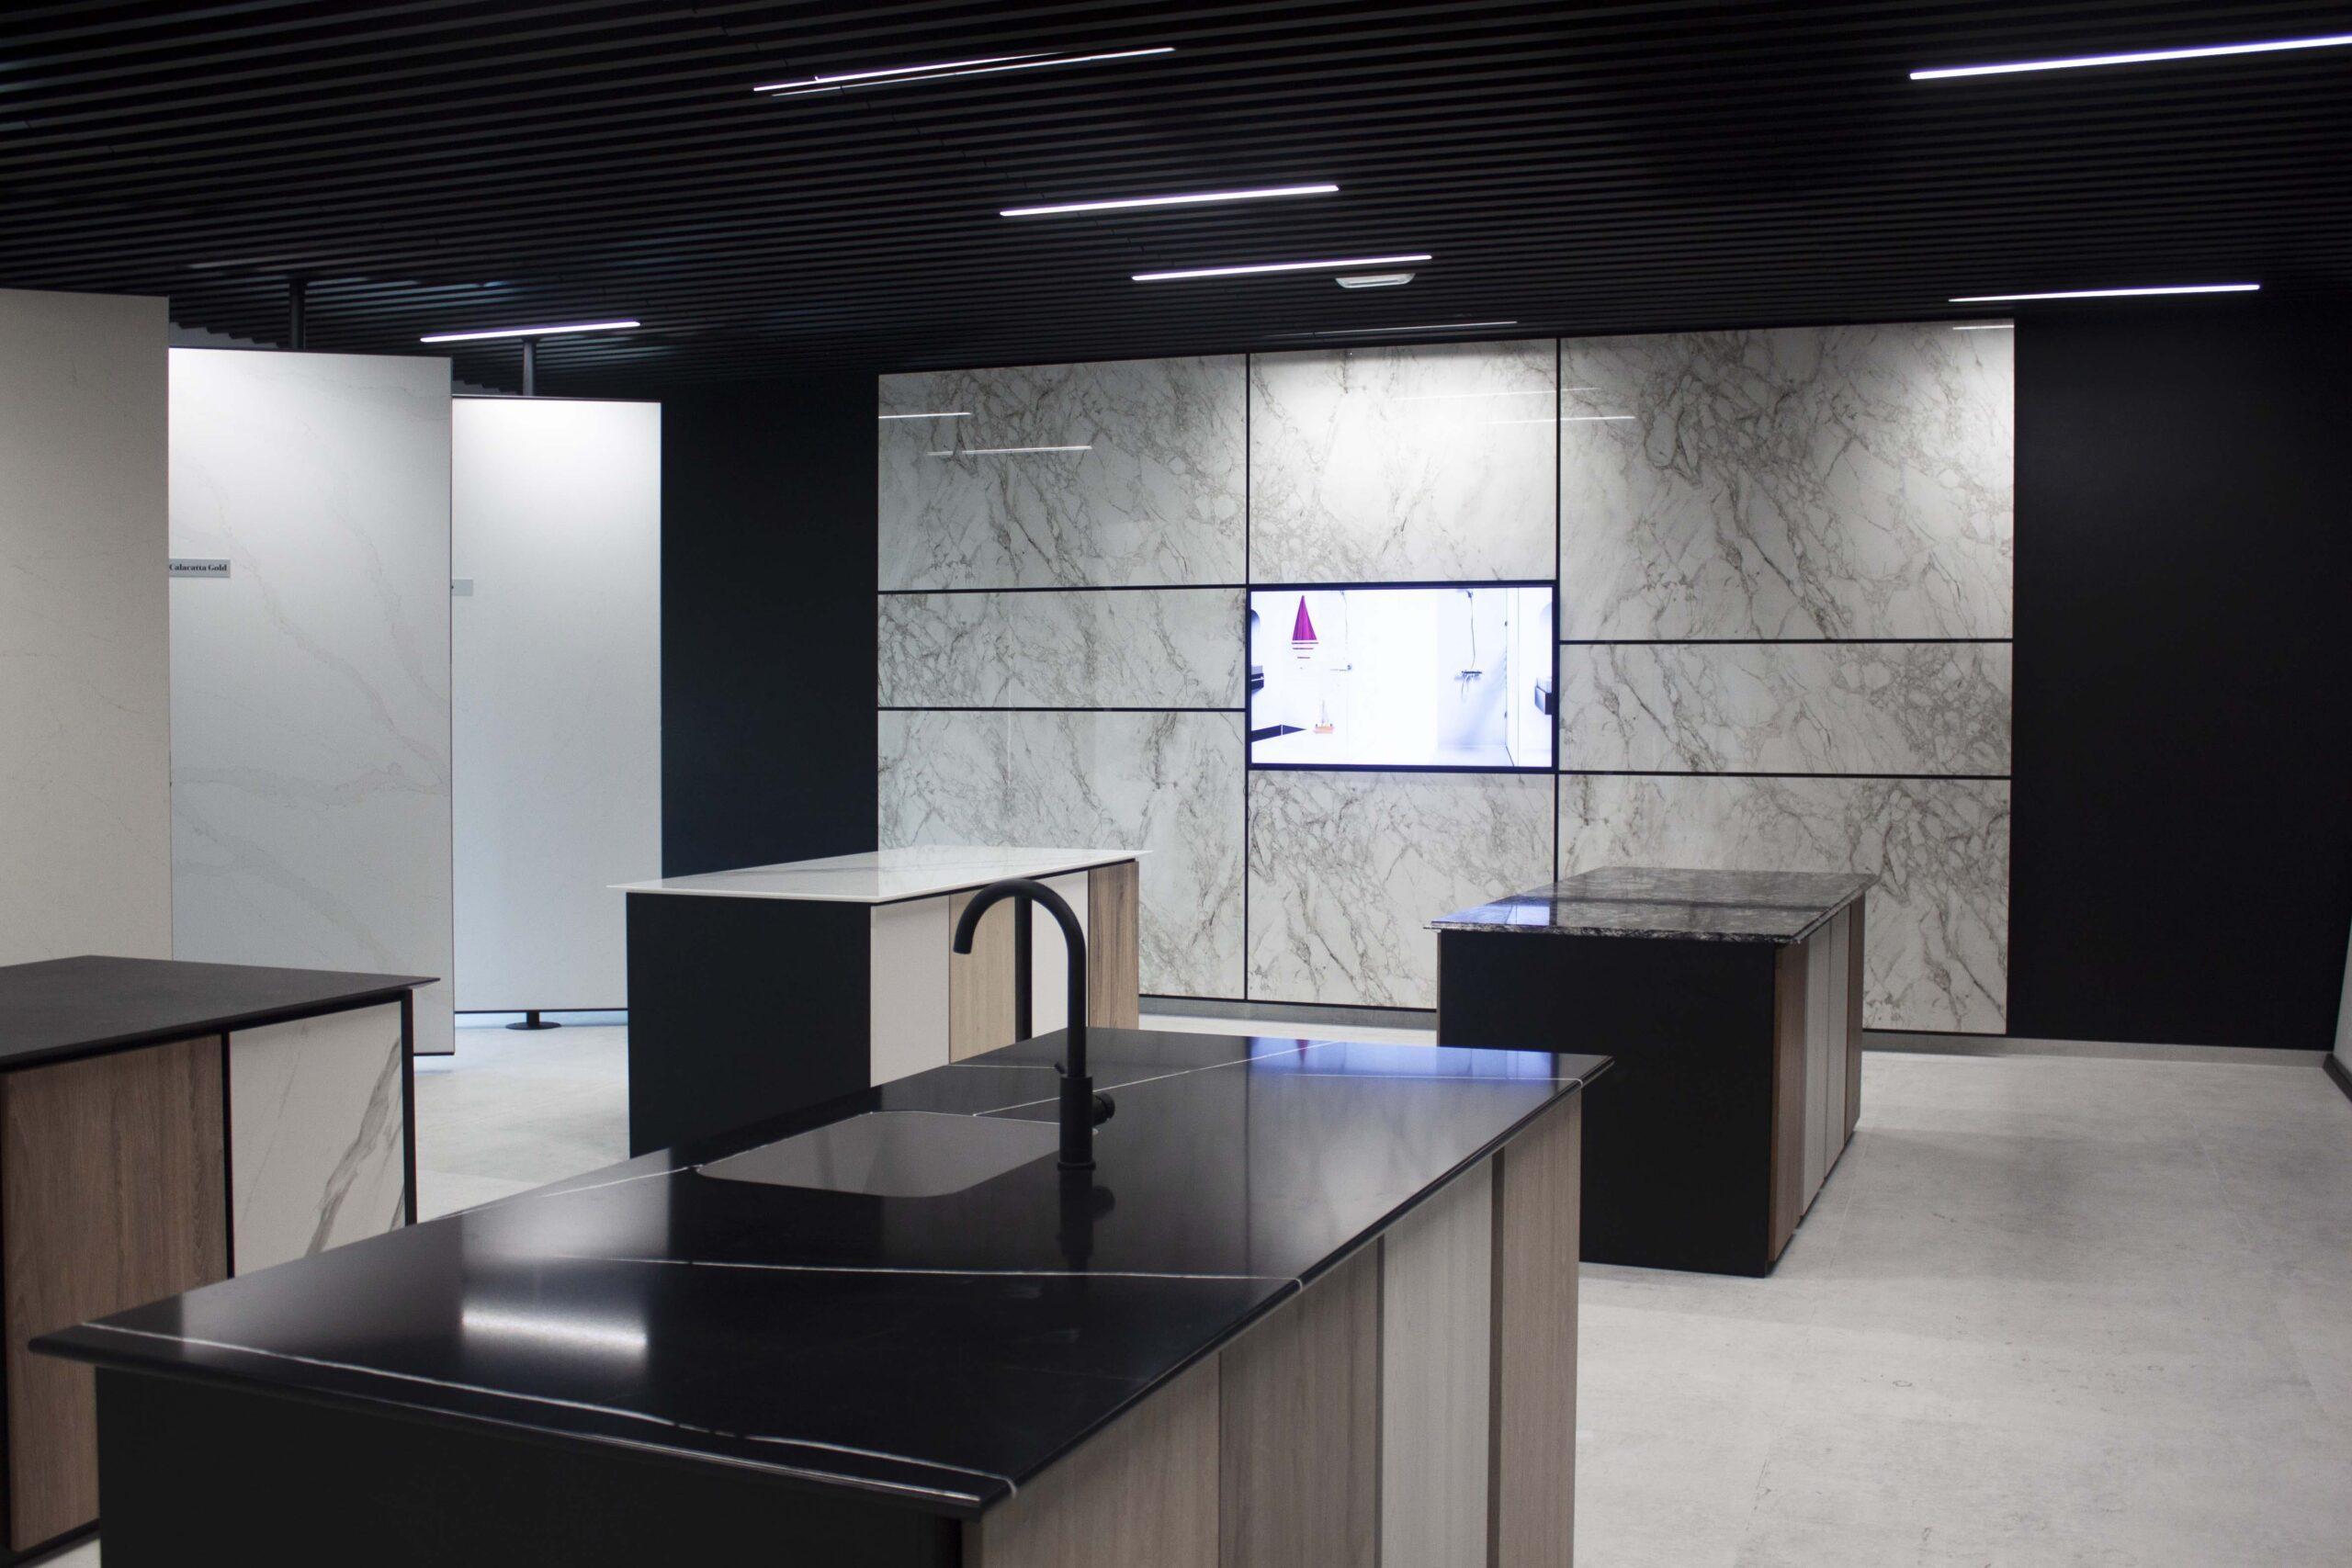 Image of Cosentino Vigo Center Showroom 3 1 scaled in Cosentino Center Vigo undertakes a beautiful renovation - Cosentino